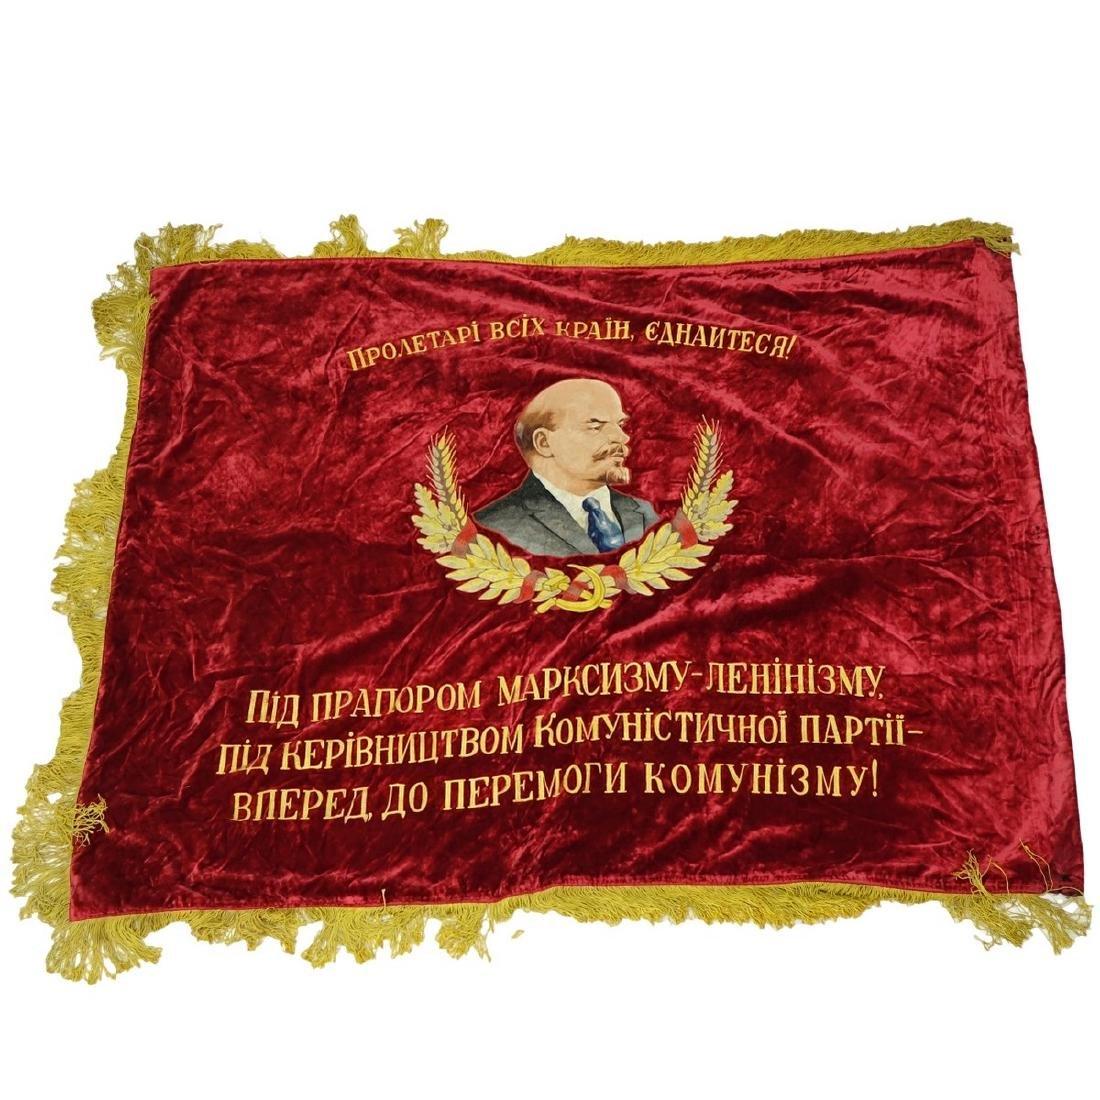 20th Century Russian Soviet Era Banner